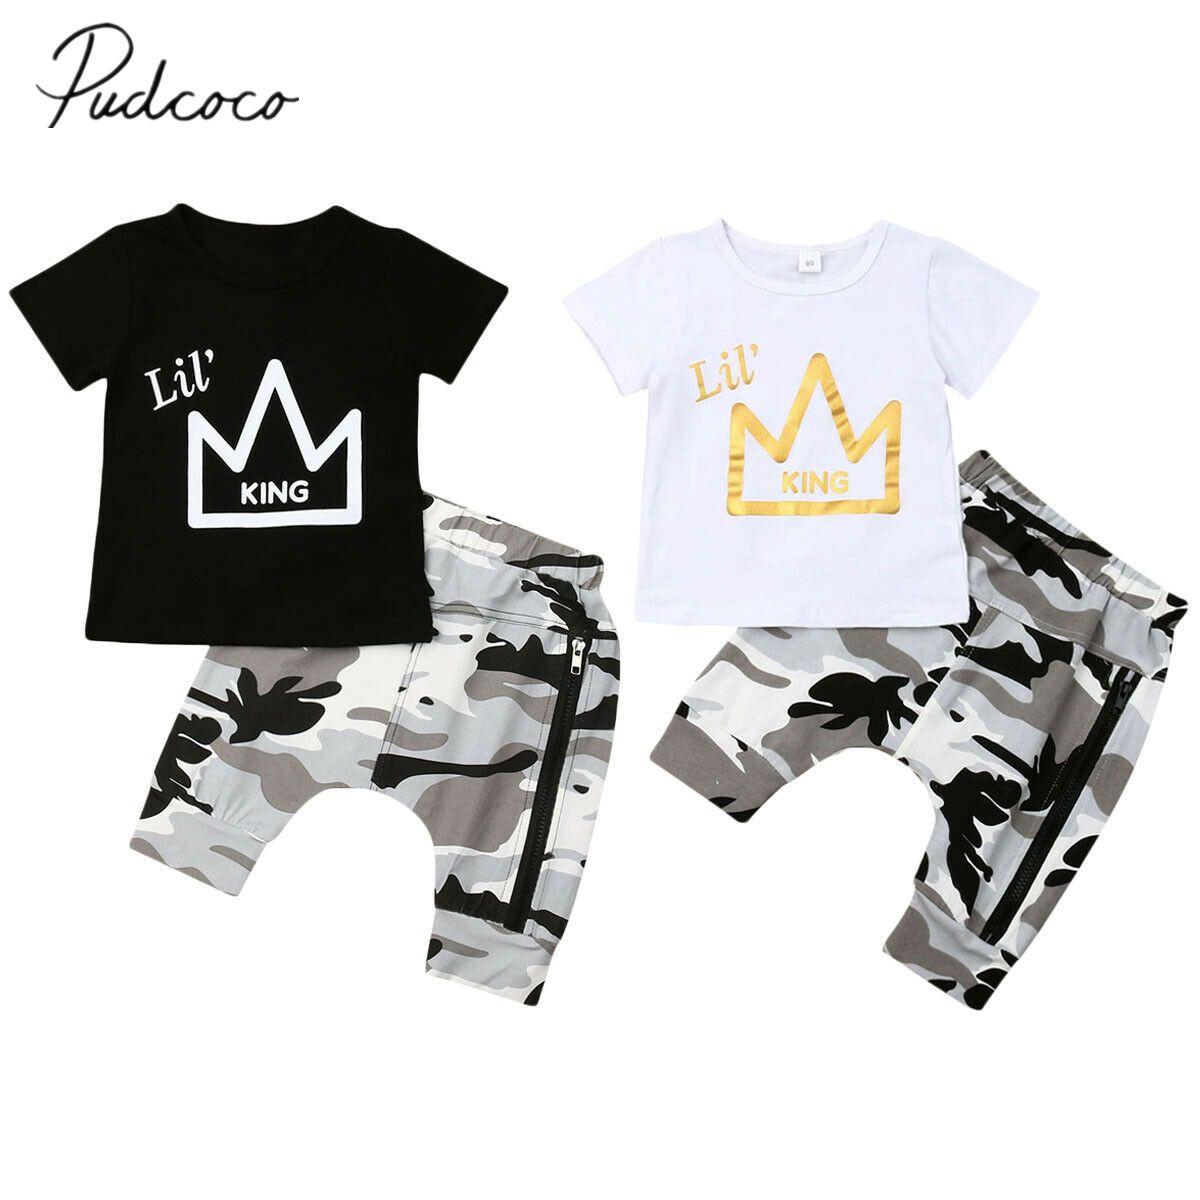 2019 Baby-Sommer-Kleidung Kleinkind-Kind-Baby-Jungen Crown Print Tops T-Shirt Camo Zip Hosen Fashion Outfits 2ST Set Kleidung